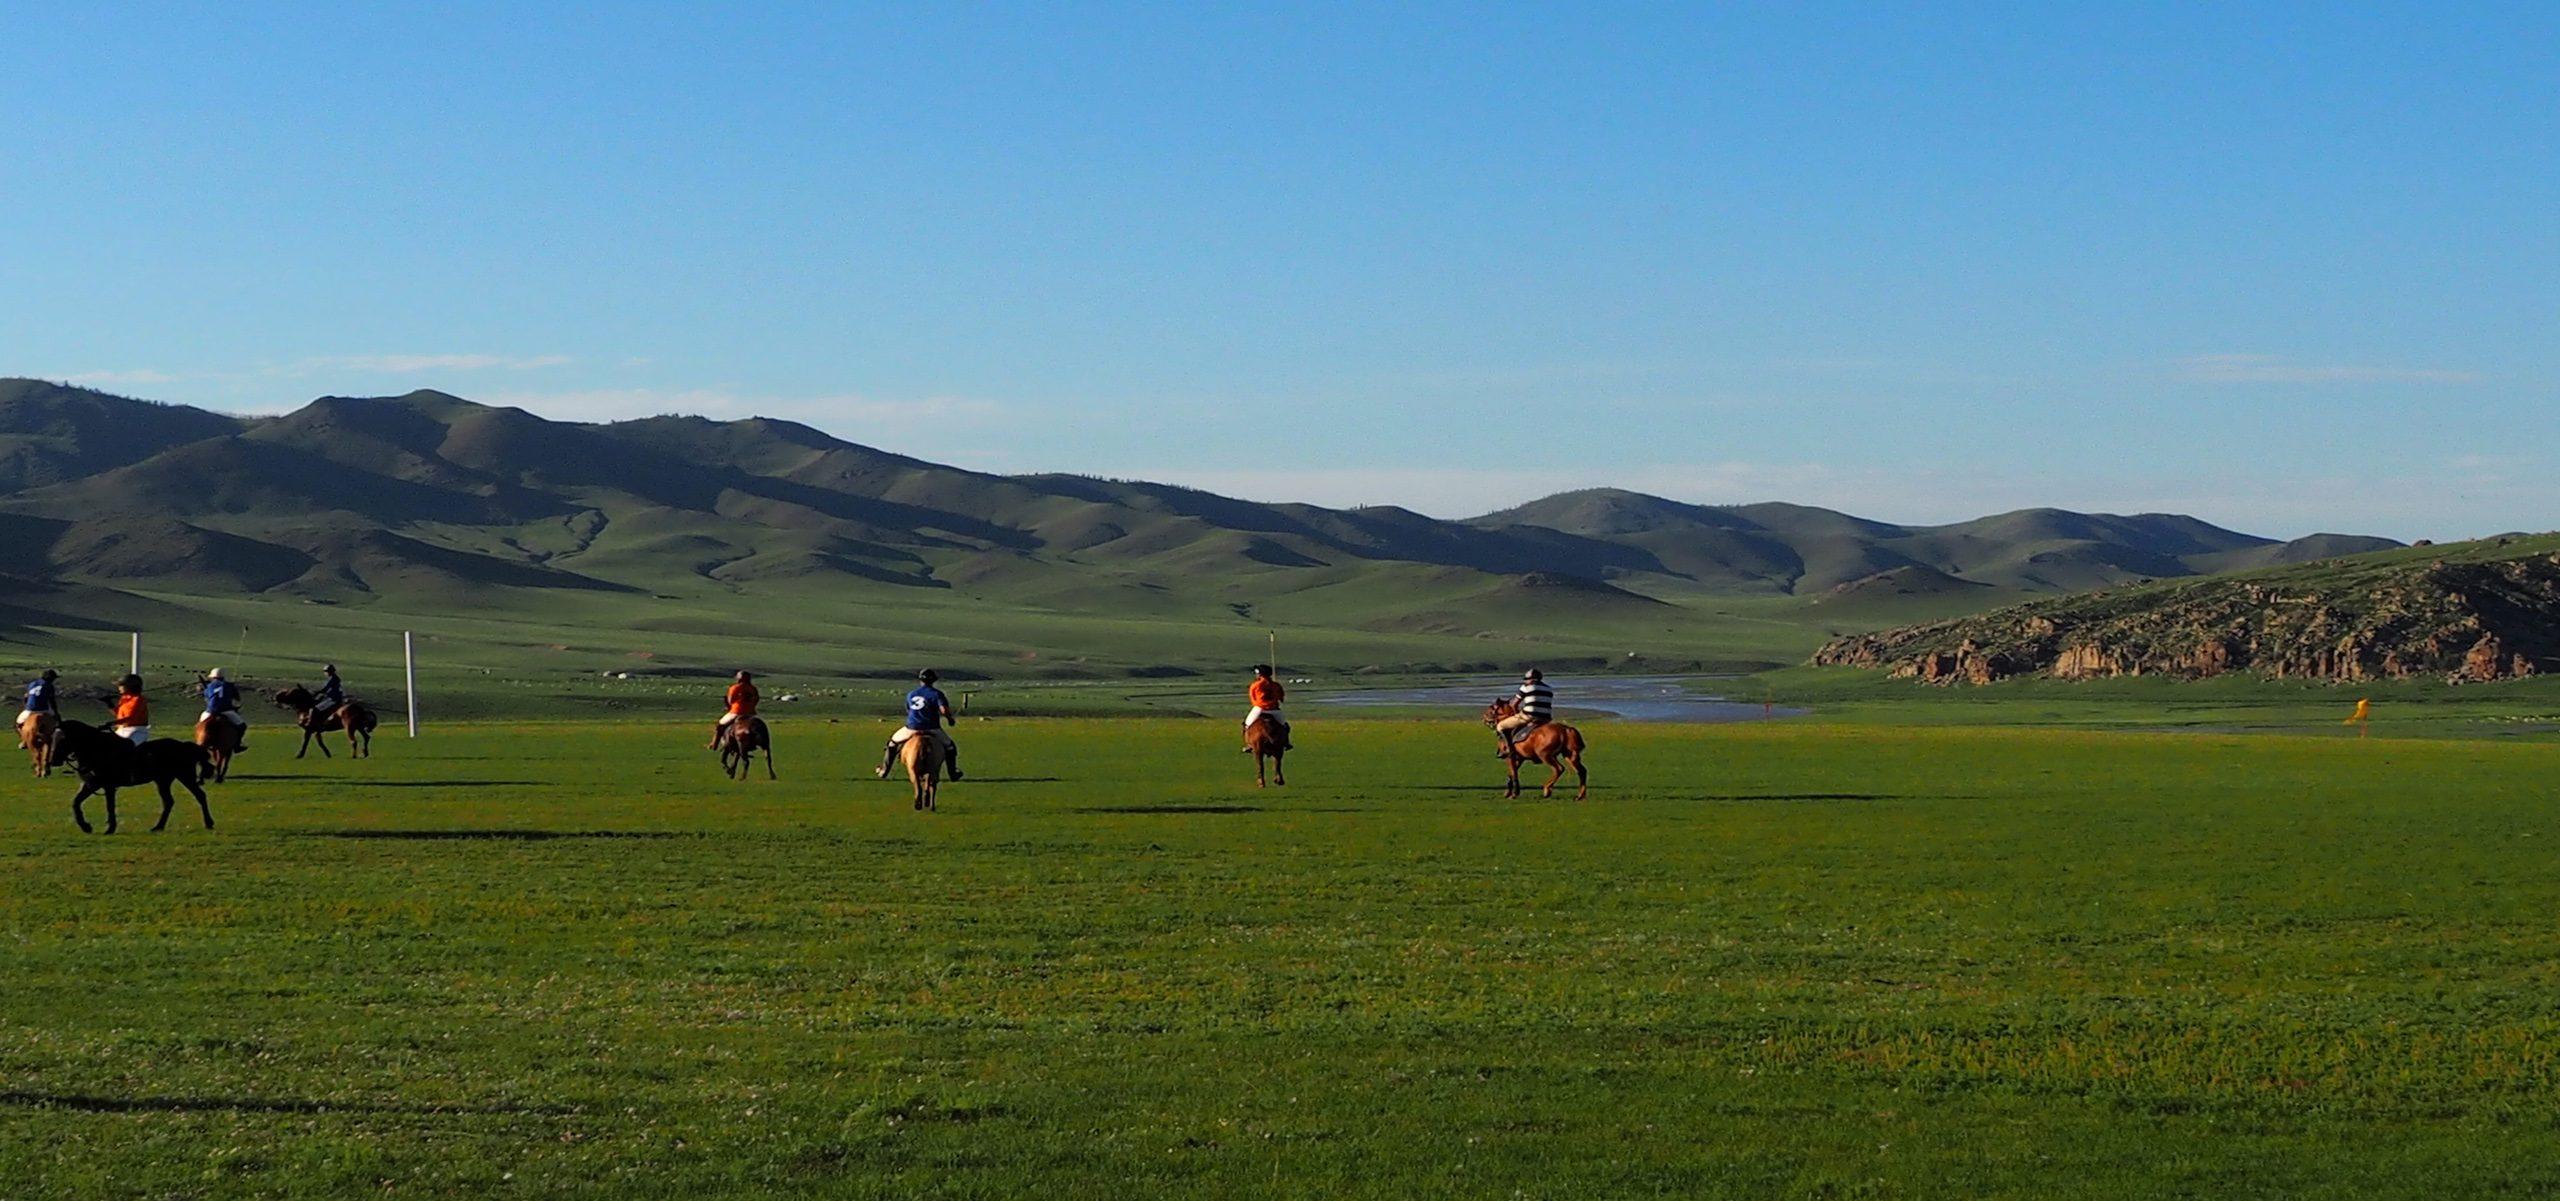 Mongolia-South Gobi